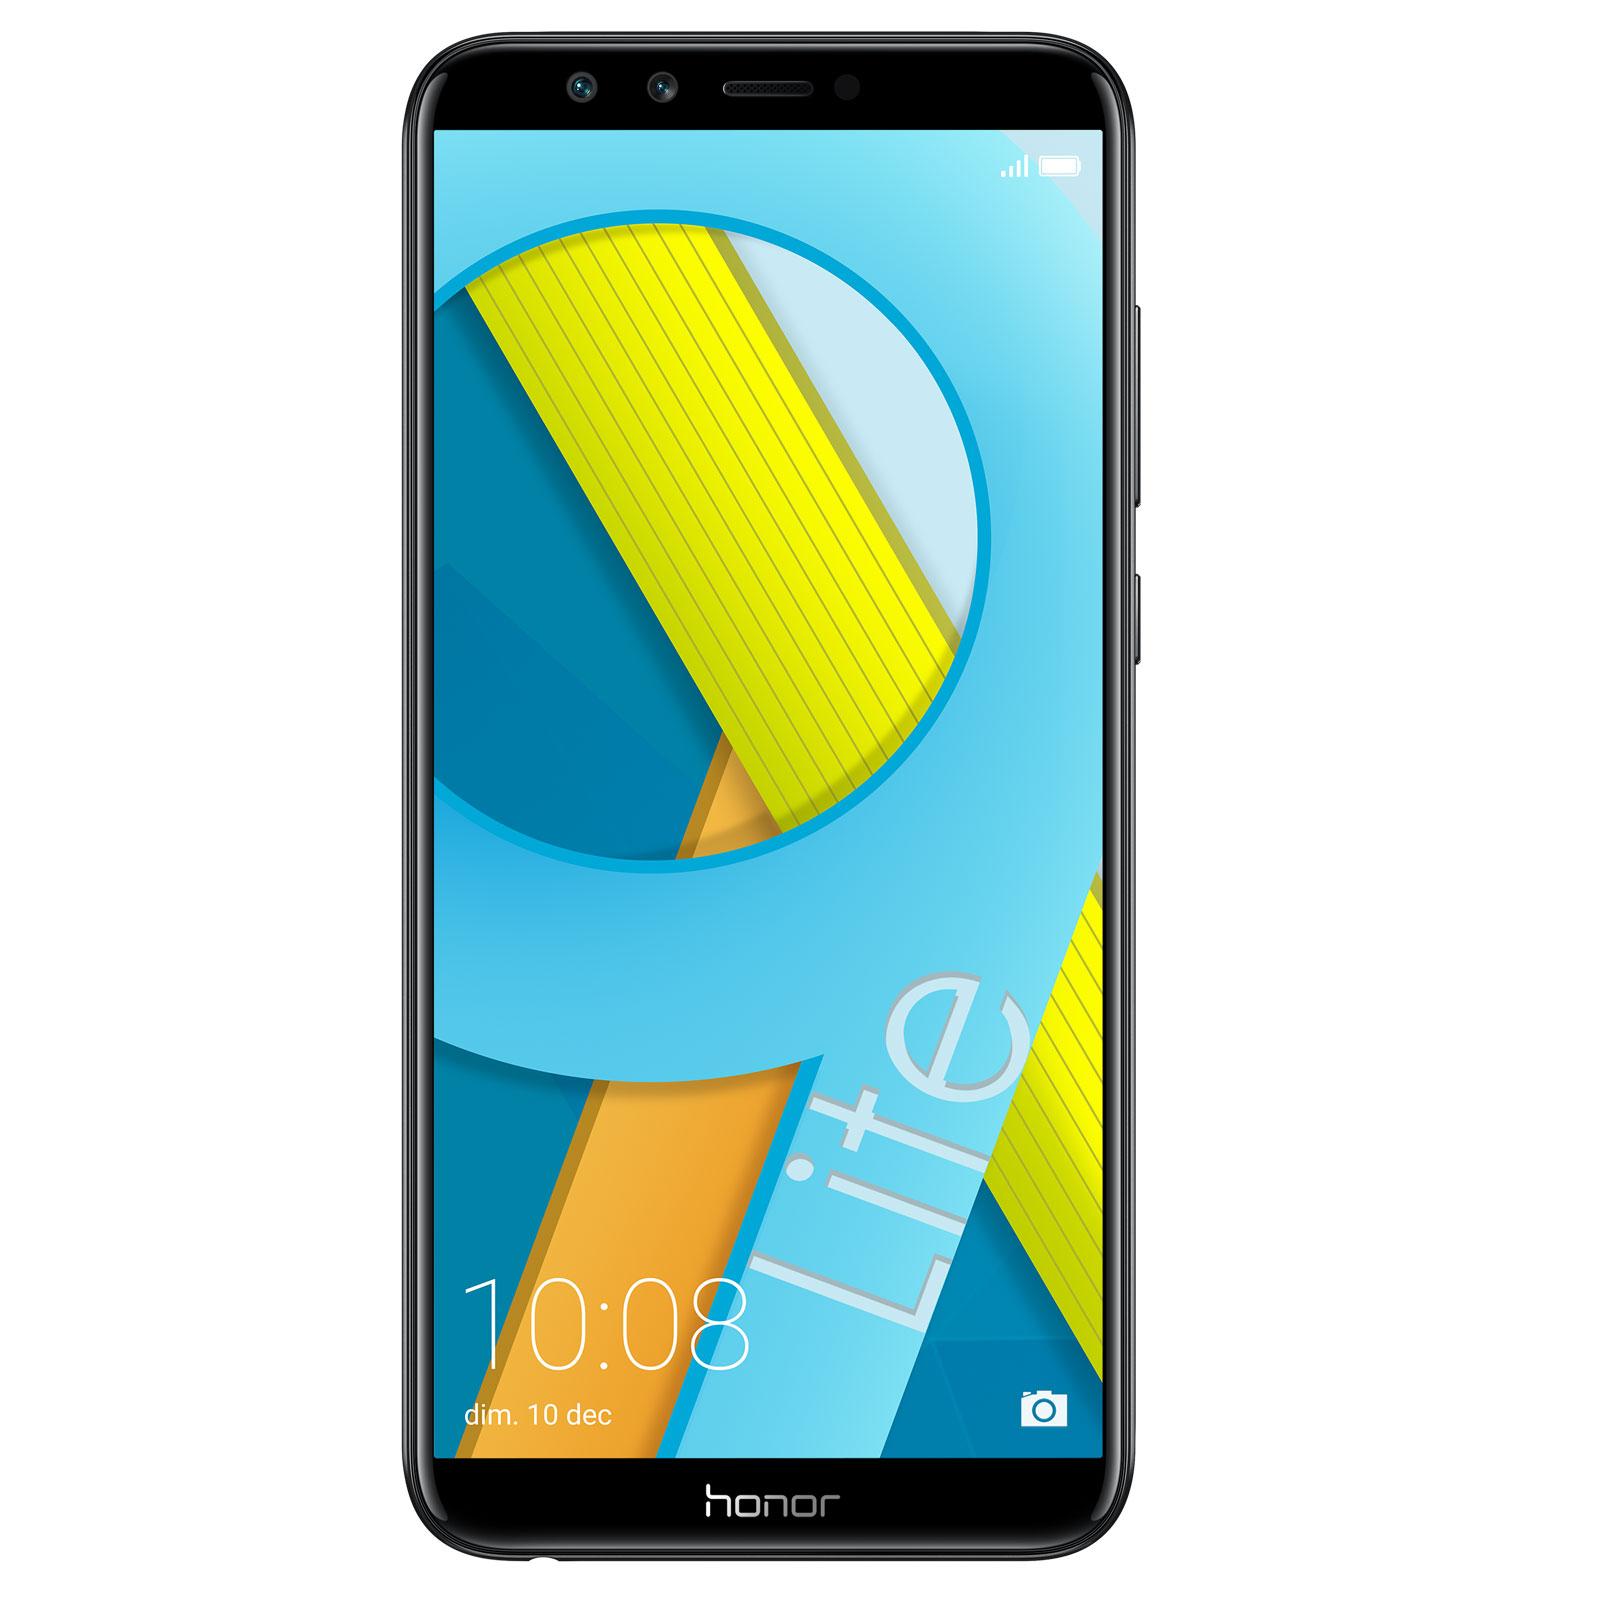 "Mobile & smartphone Honor 9 Lite Noir (3 Go / 32 Go) Smartphone 4G-LTE Dual SIM - Kirin 659 8-Core 2,36 GHz - RAM 3 Go - Ecran tactile 5.65"" 1080 x 2160 - 32 Go - NFC/Bluetooth 4.2 - 3000 mAh - Android 8.0"